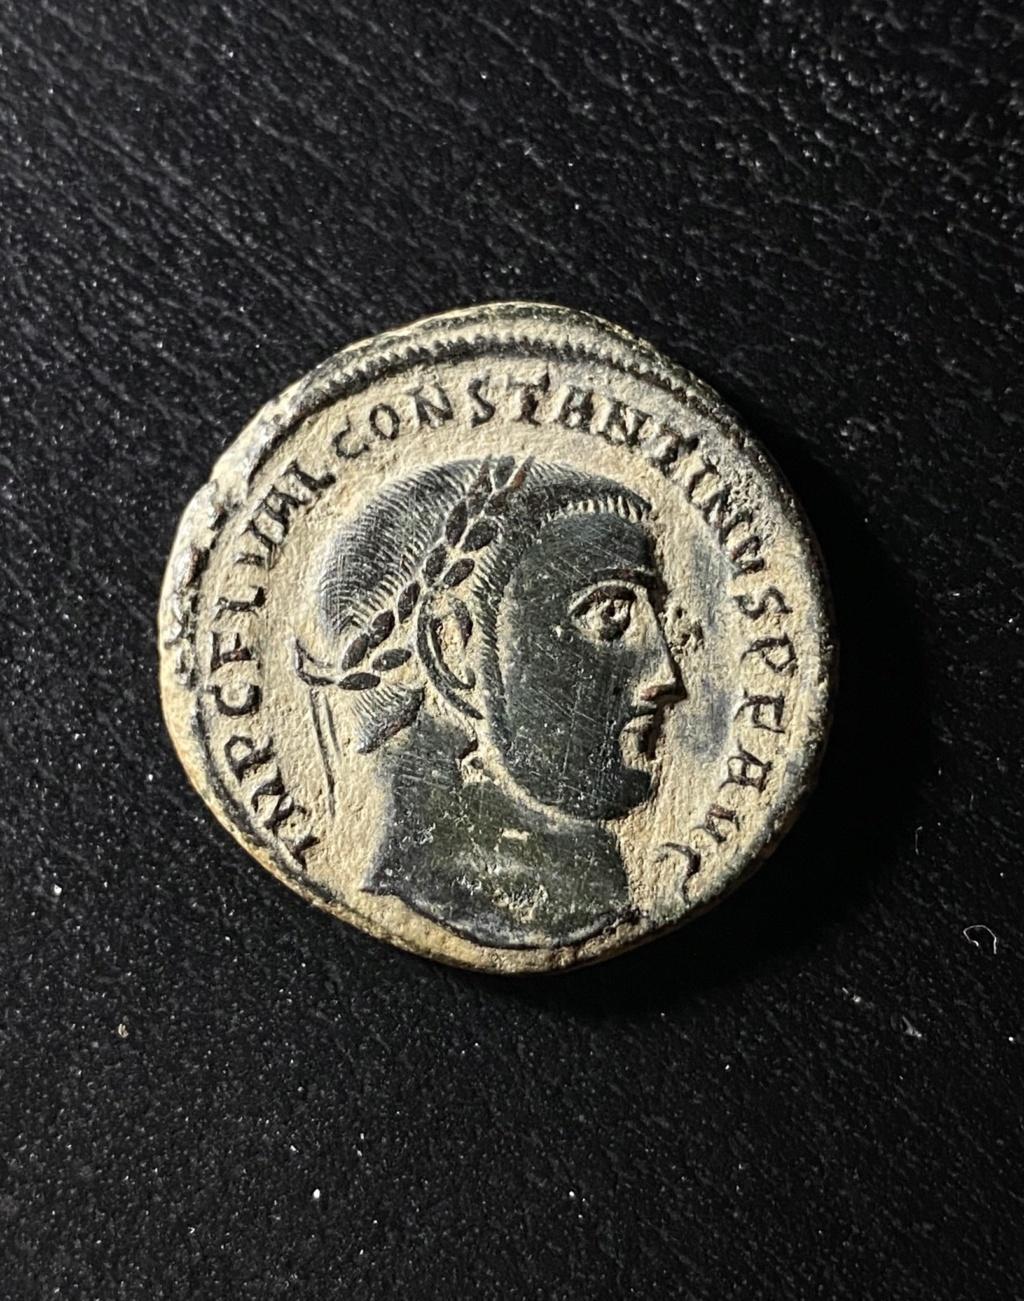 Le GENIO de Constantin I Cac53810